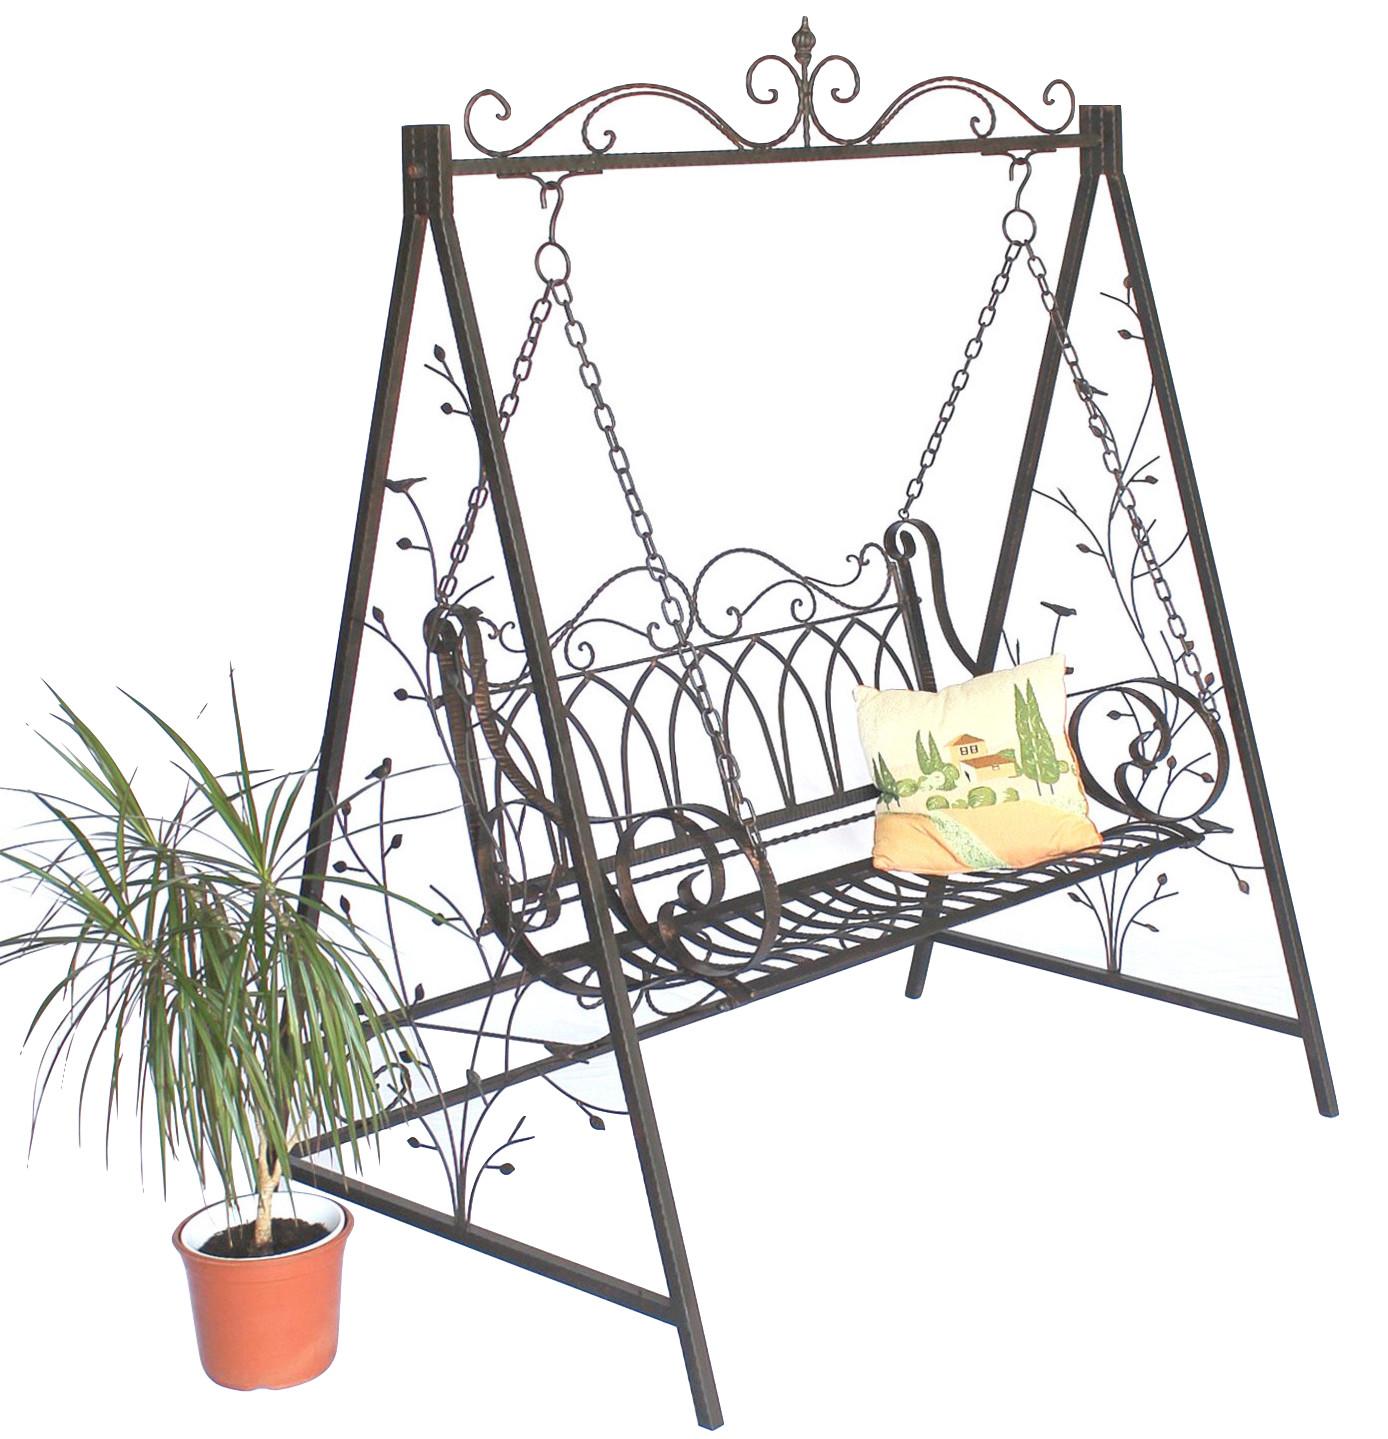 schaukel hollywoodschaukel 18688 mit ketten metall schmiedeeisen gartenschaukel ebay. Black Bedroom Furniture Sets. Home Design Ideas